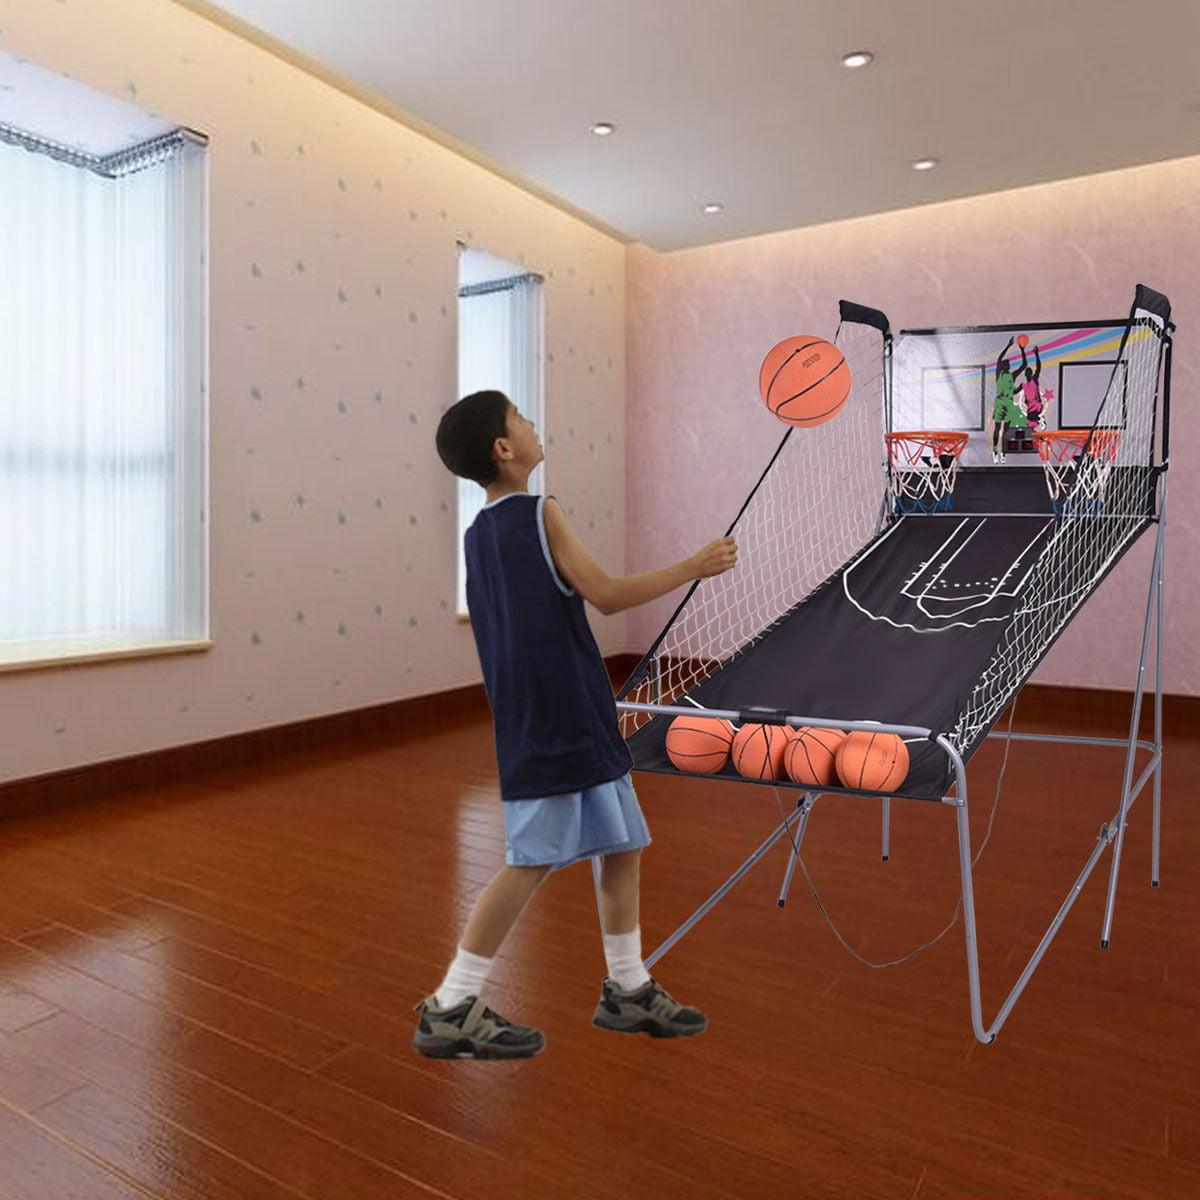 Costway Indoor Basketball Arcade Game Double Electronic Hoops shot 2 Player W/ 4 Balls